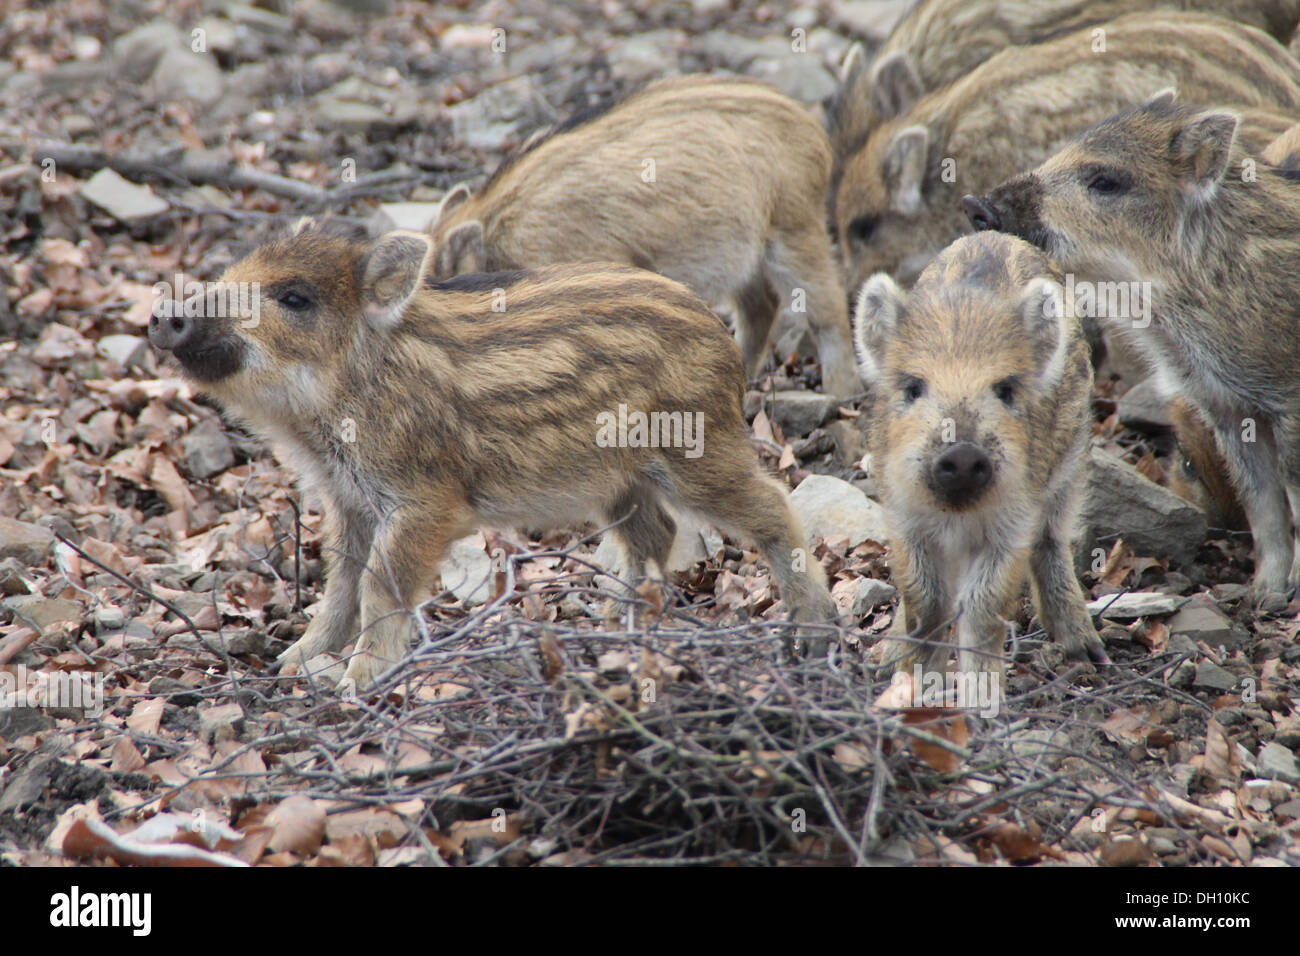 Piglets - Stock Image